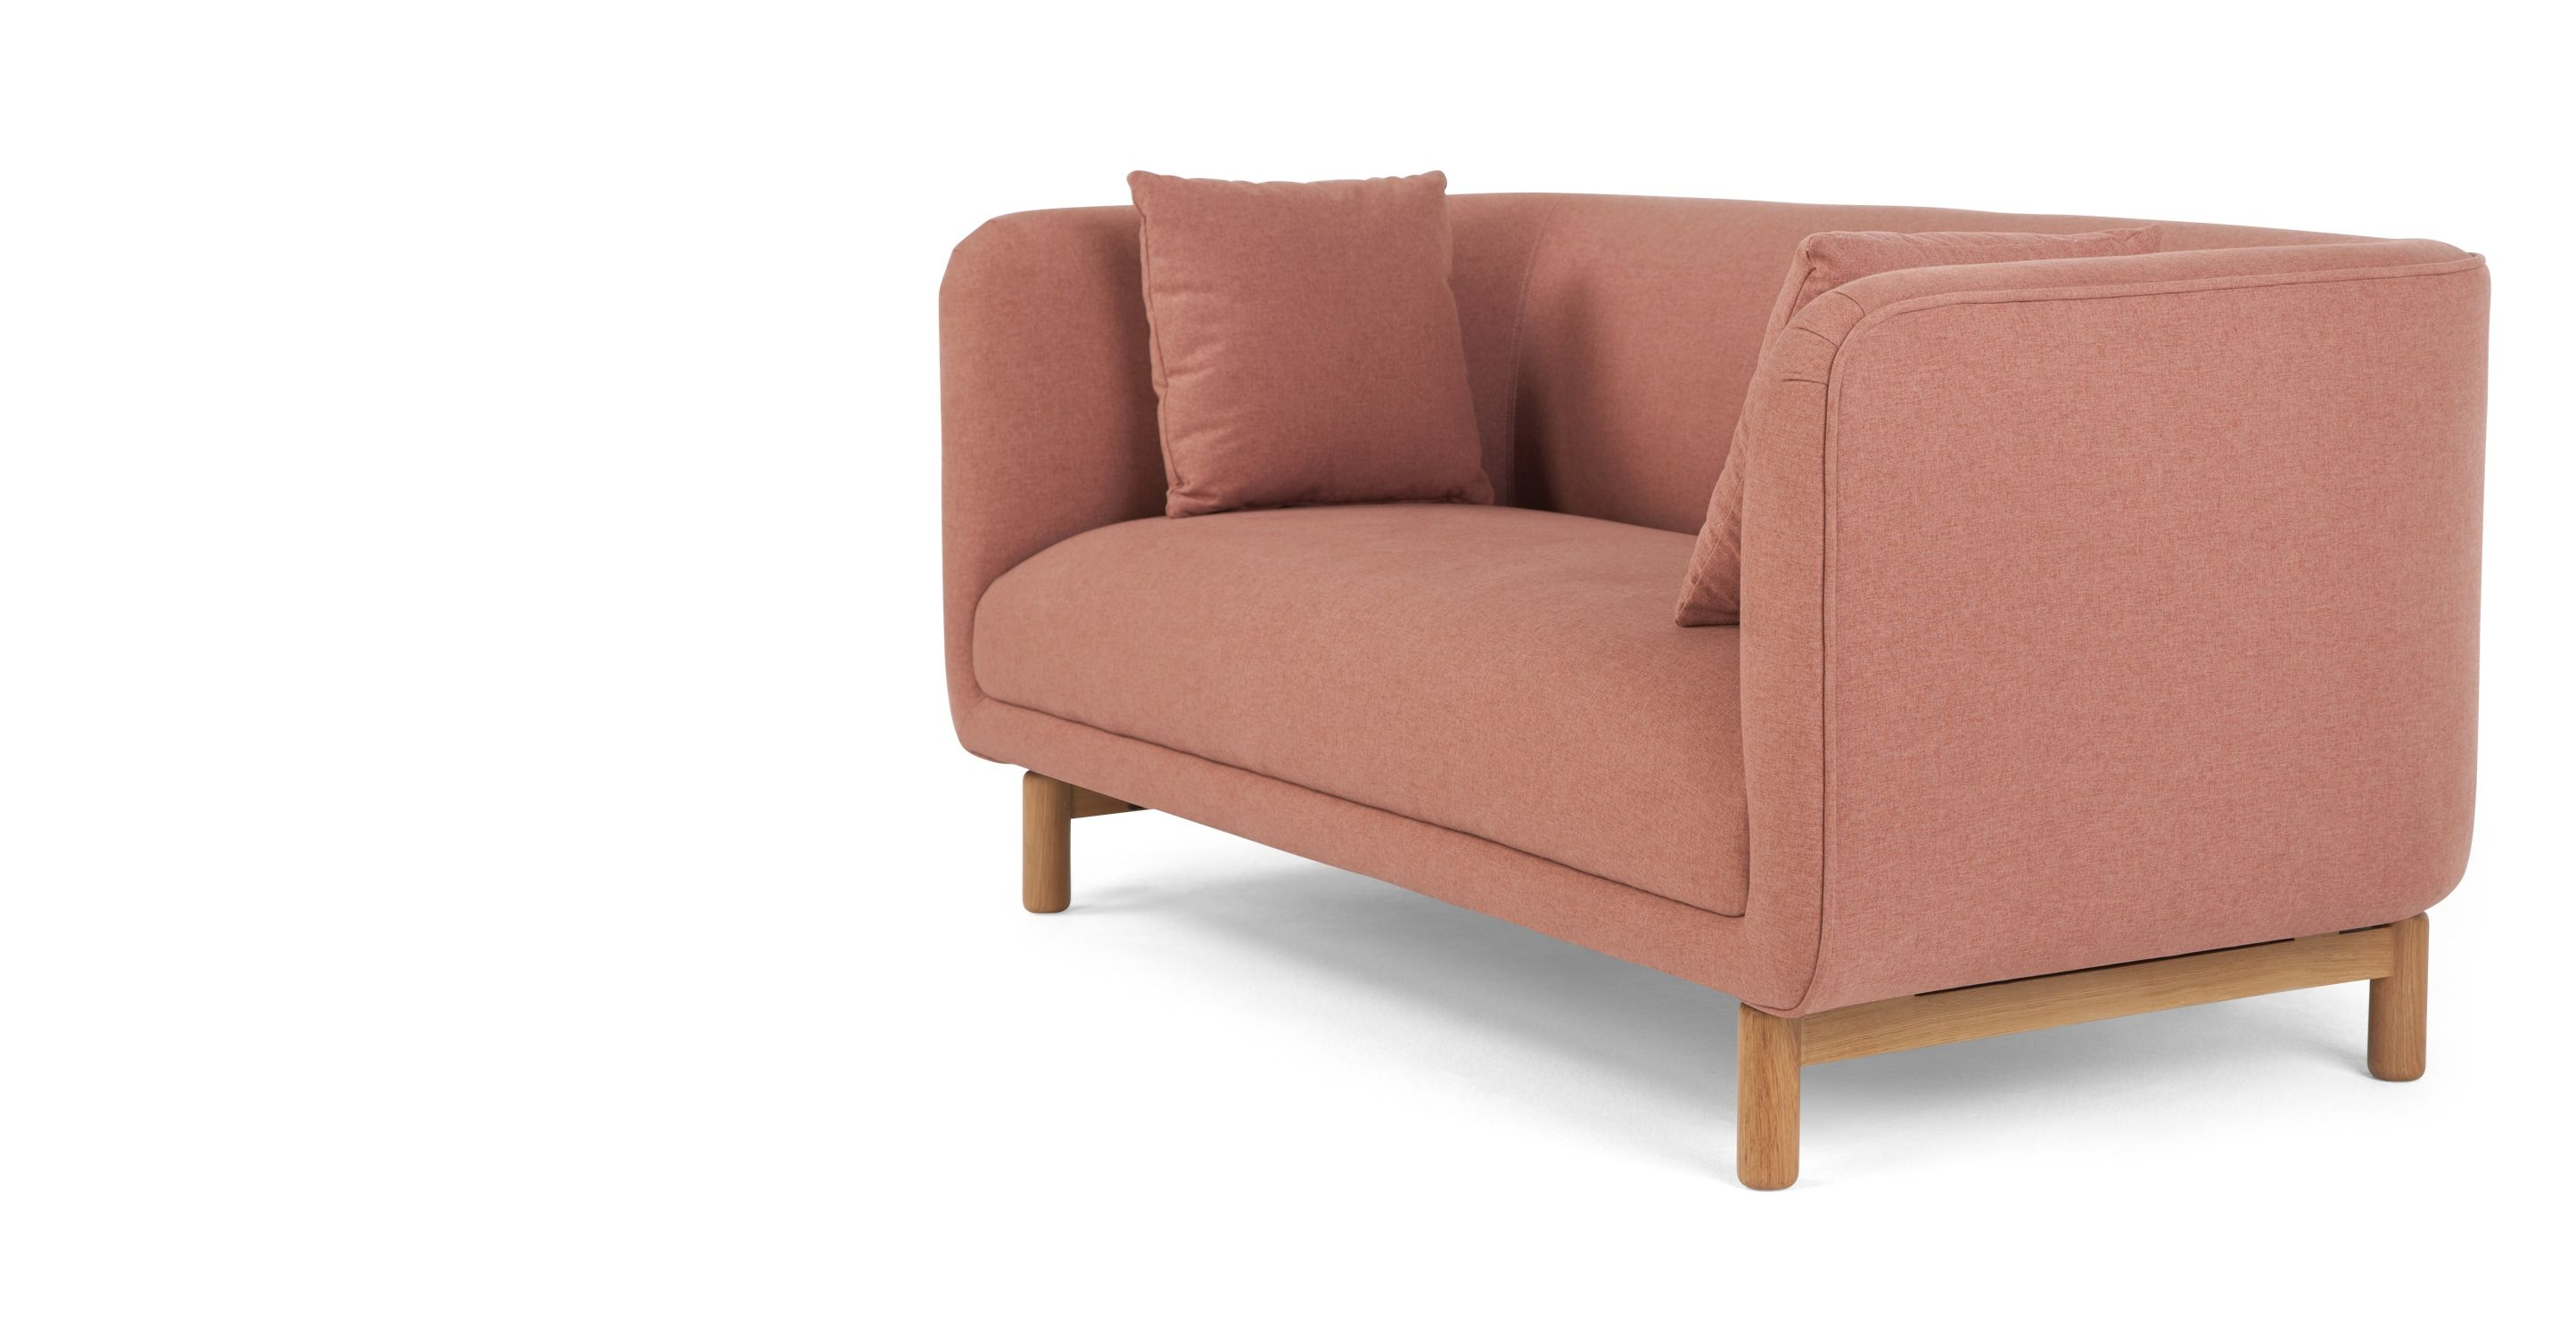 Tribeca 2 Sitzer Sofa Altrosa 2 Seater Sofa Seater Sofa Sofa Colors